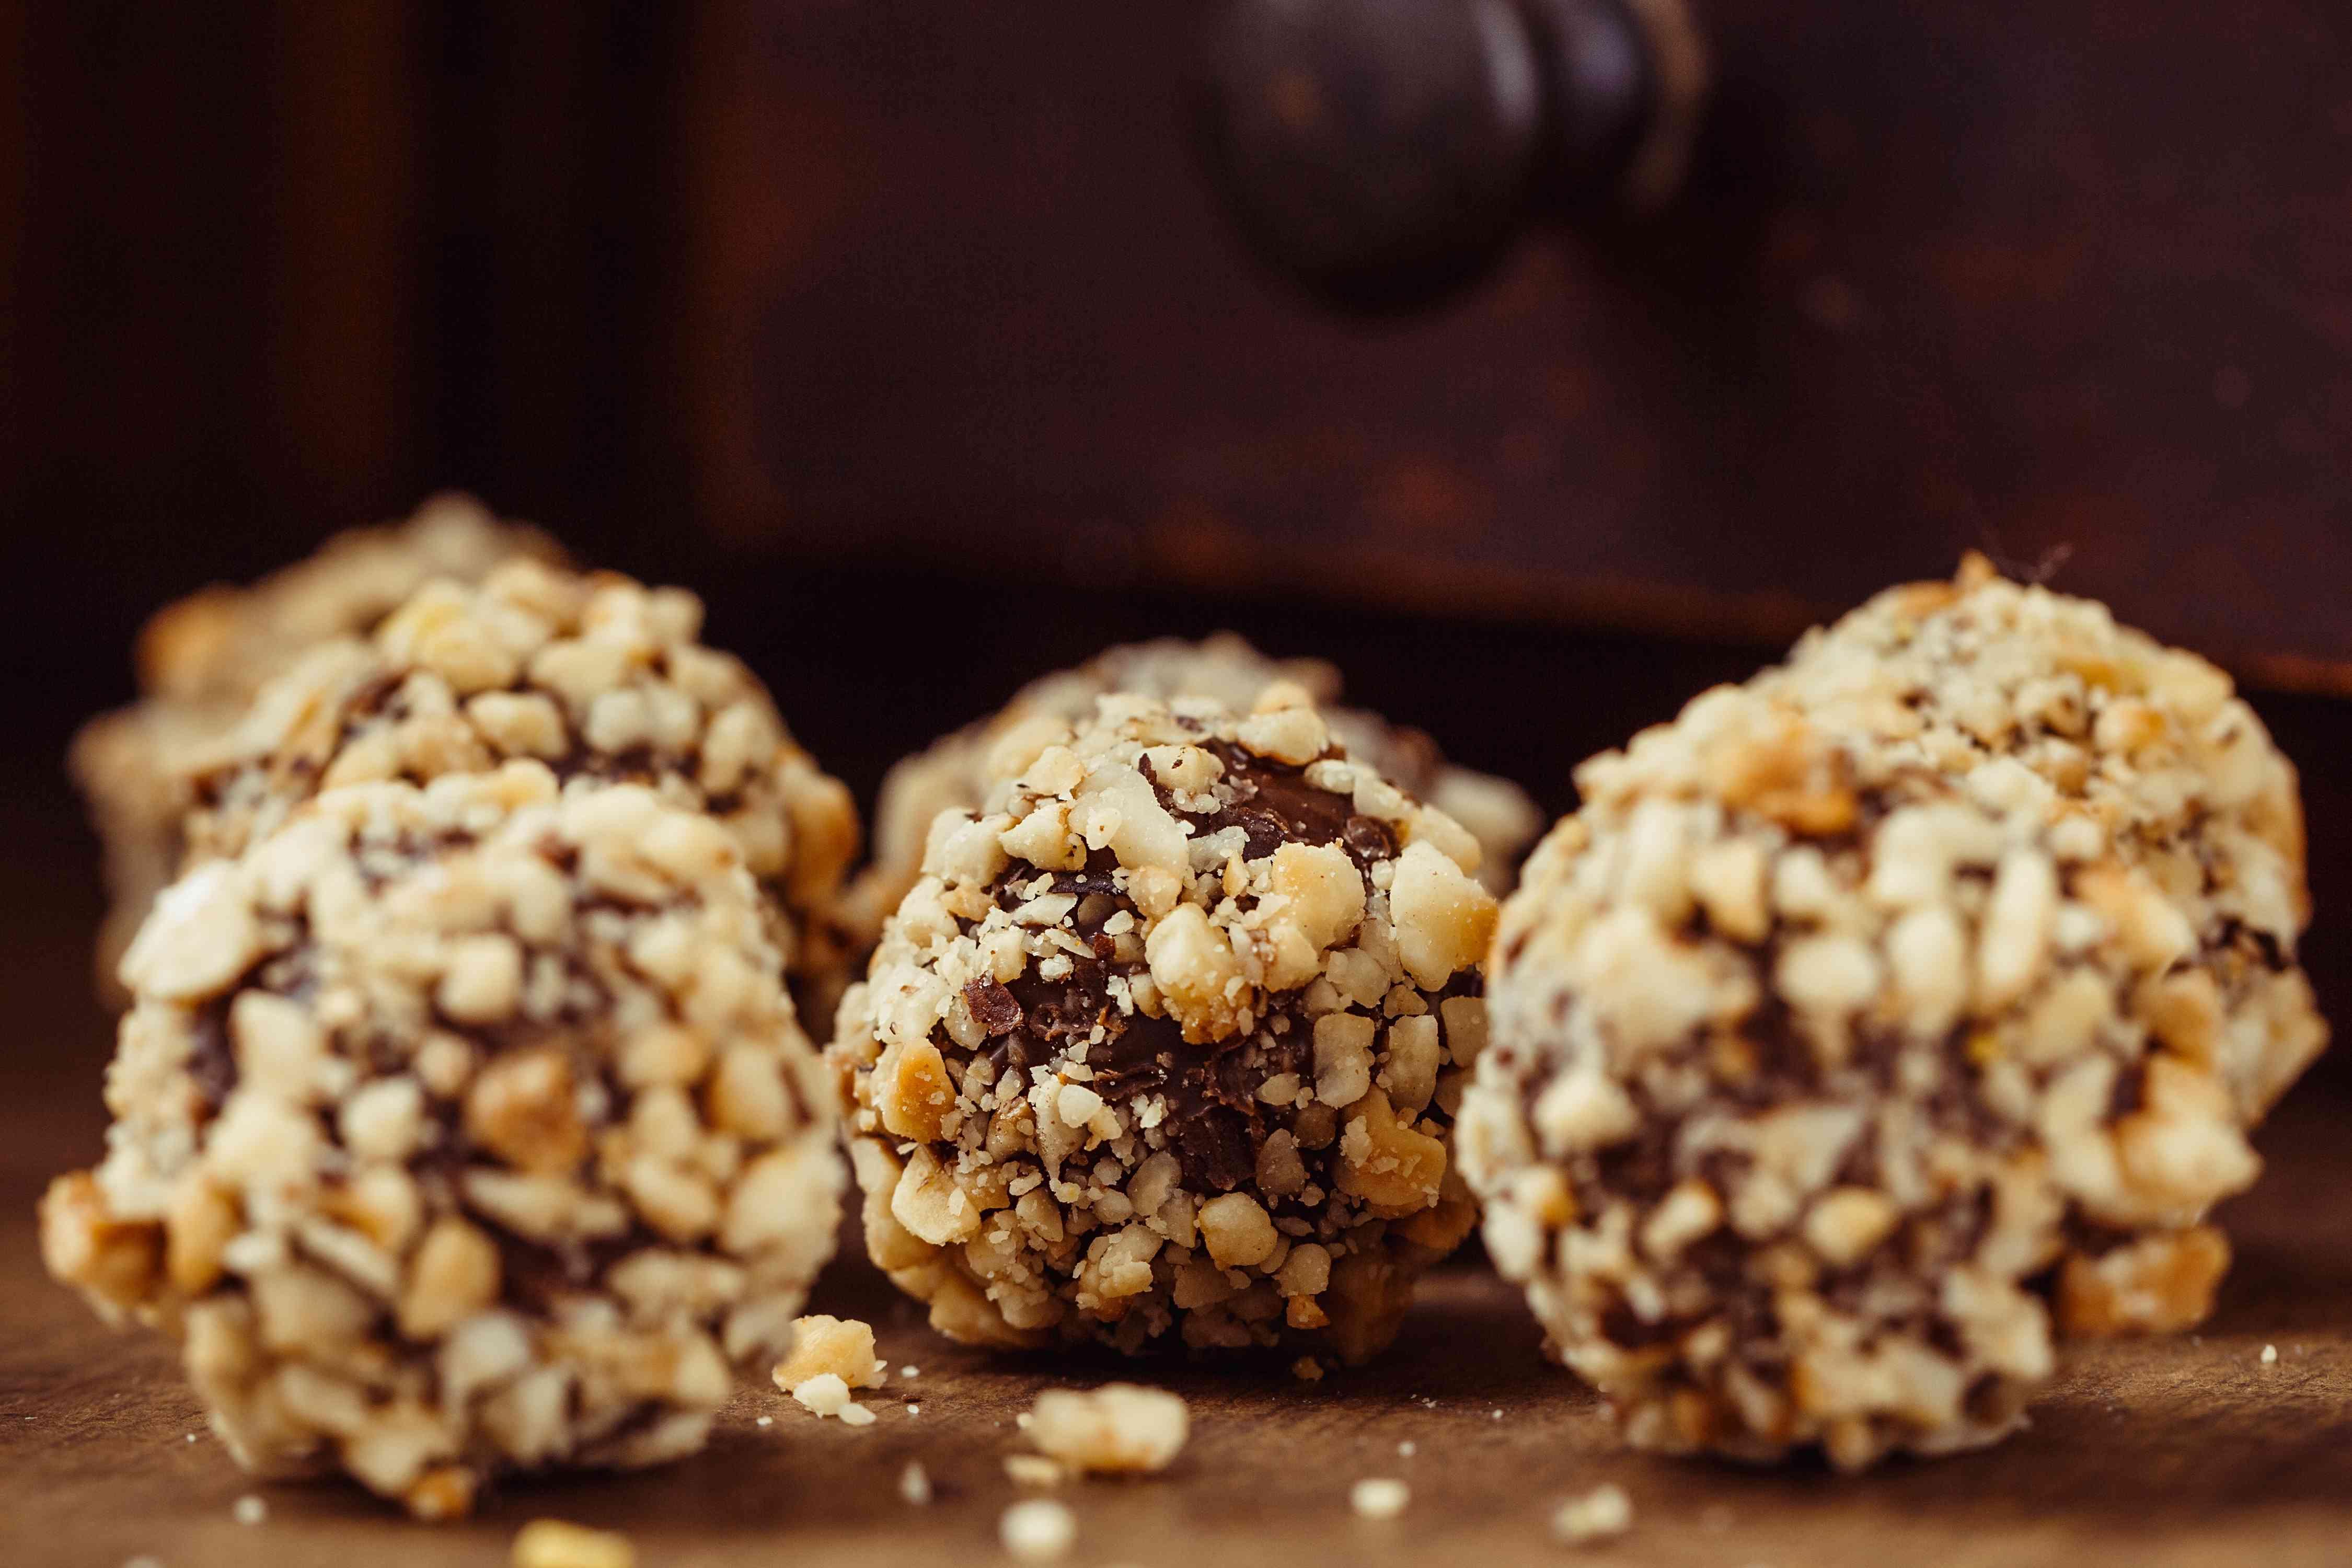 Homemade hazelnut truffle candies